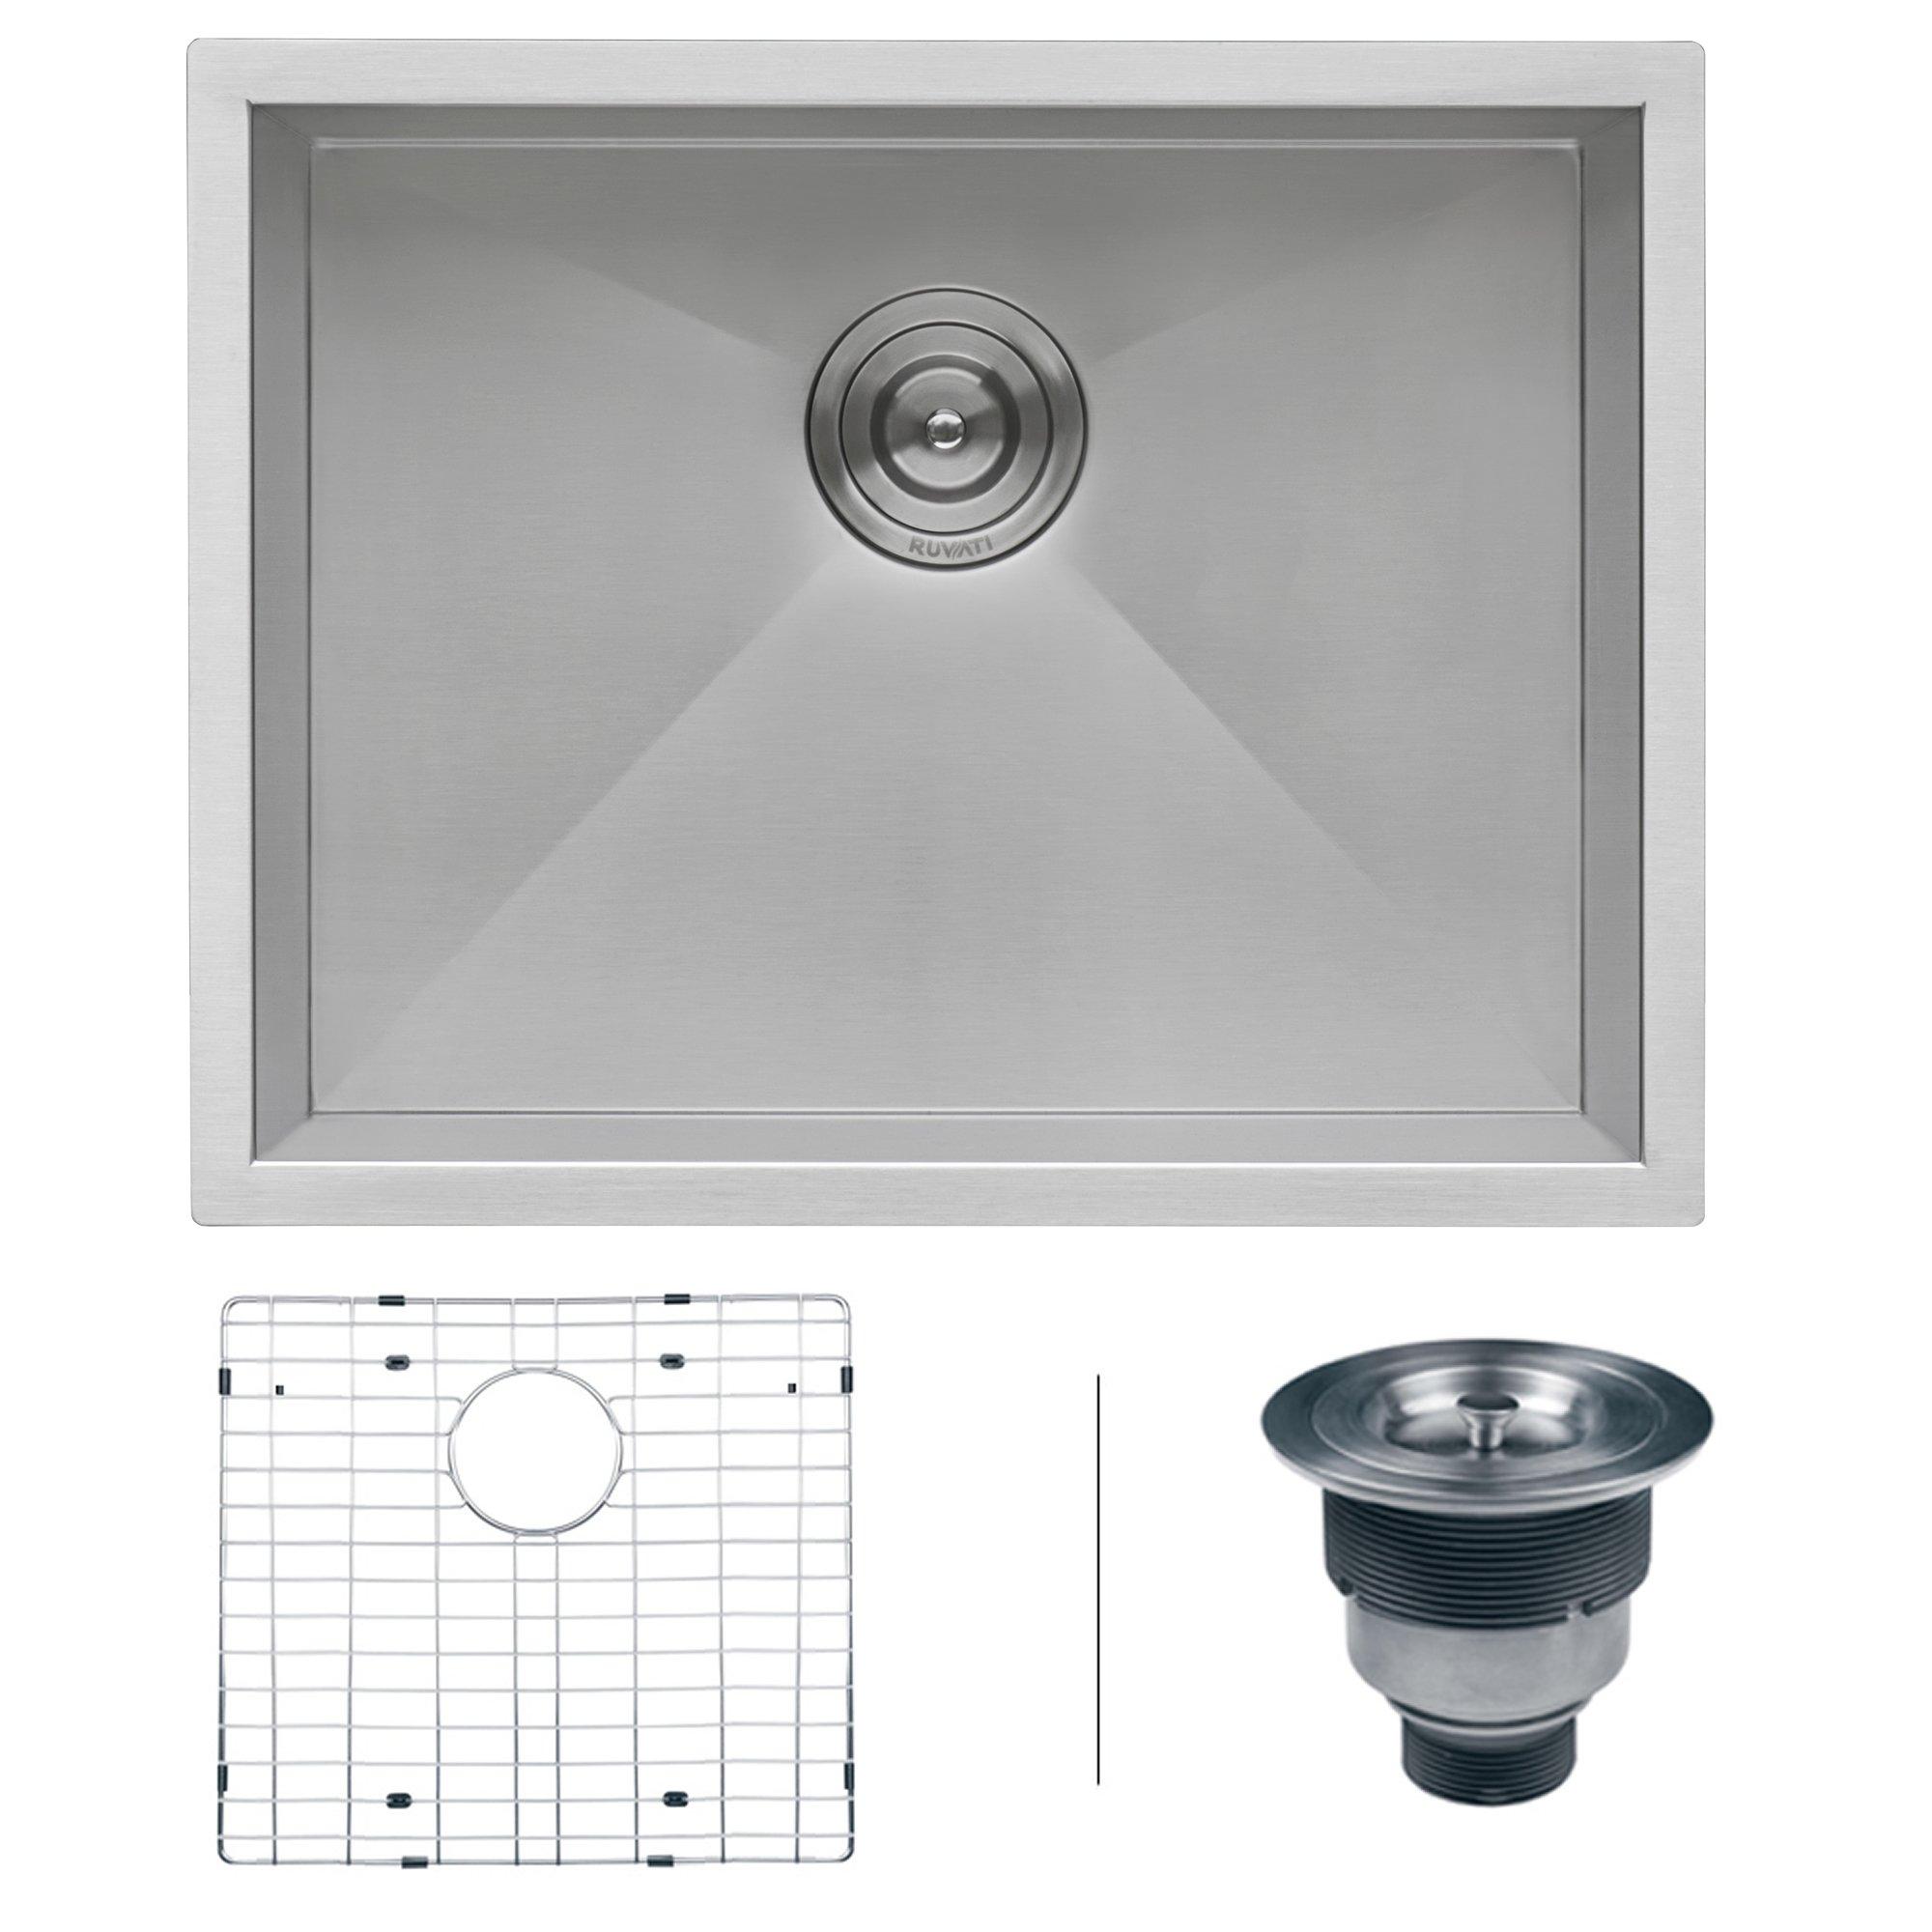 Ruvati 23-inch Undermount 16 Gauge Zero Radius Kitchen Sink Stainless Steel Single Bowl - RVH7100